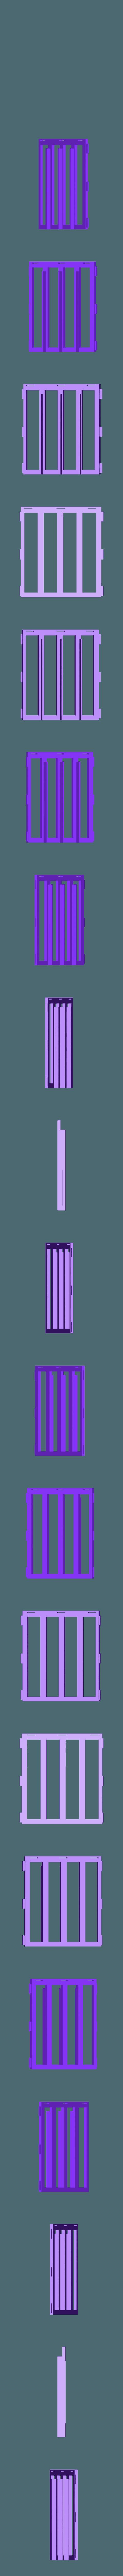 Panel derecho.stl Download STL file Modular desktop organizer • 3D printing design, LnZProd